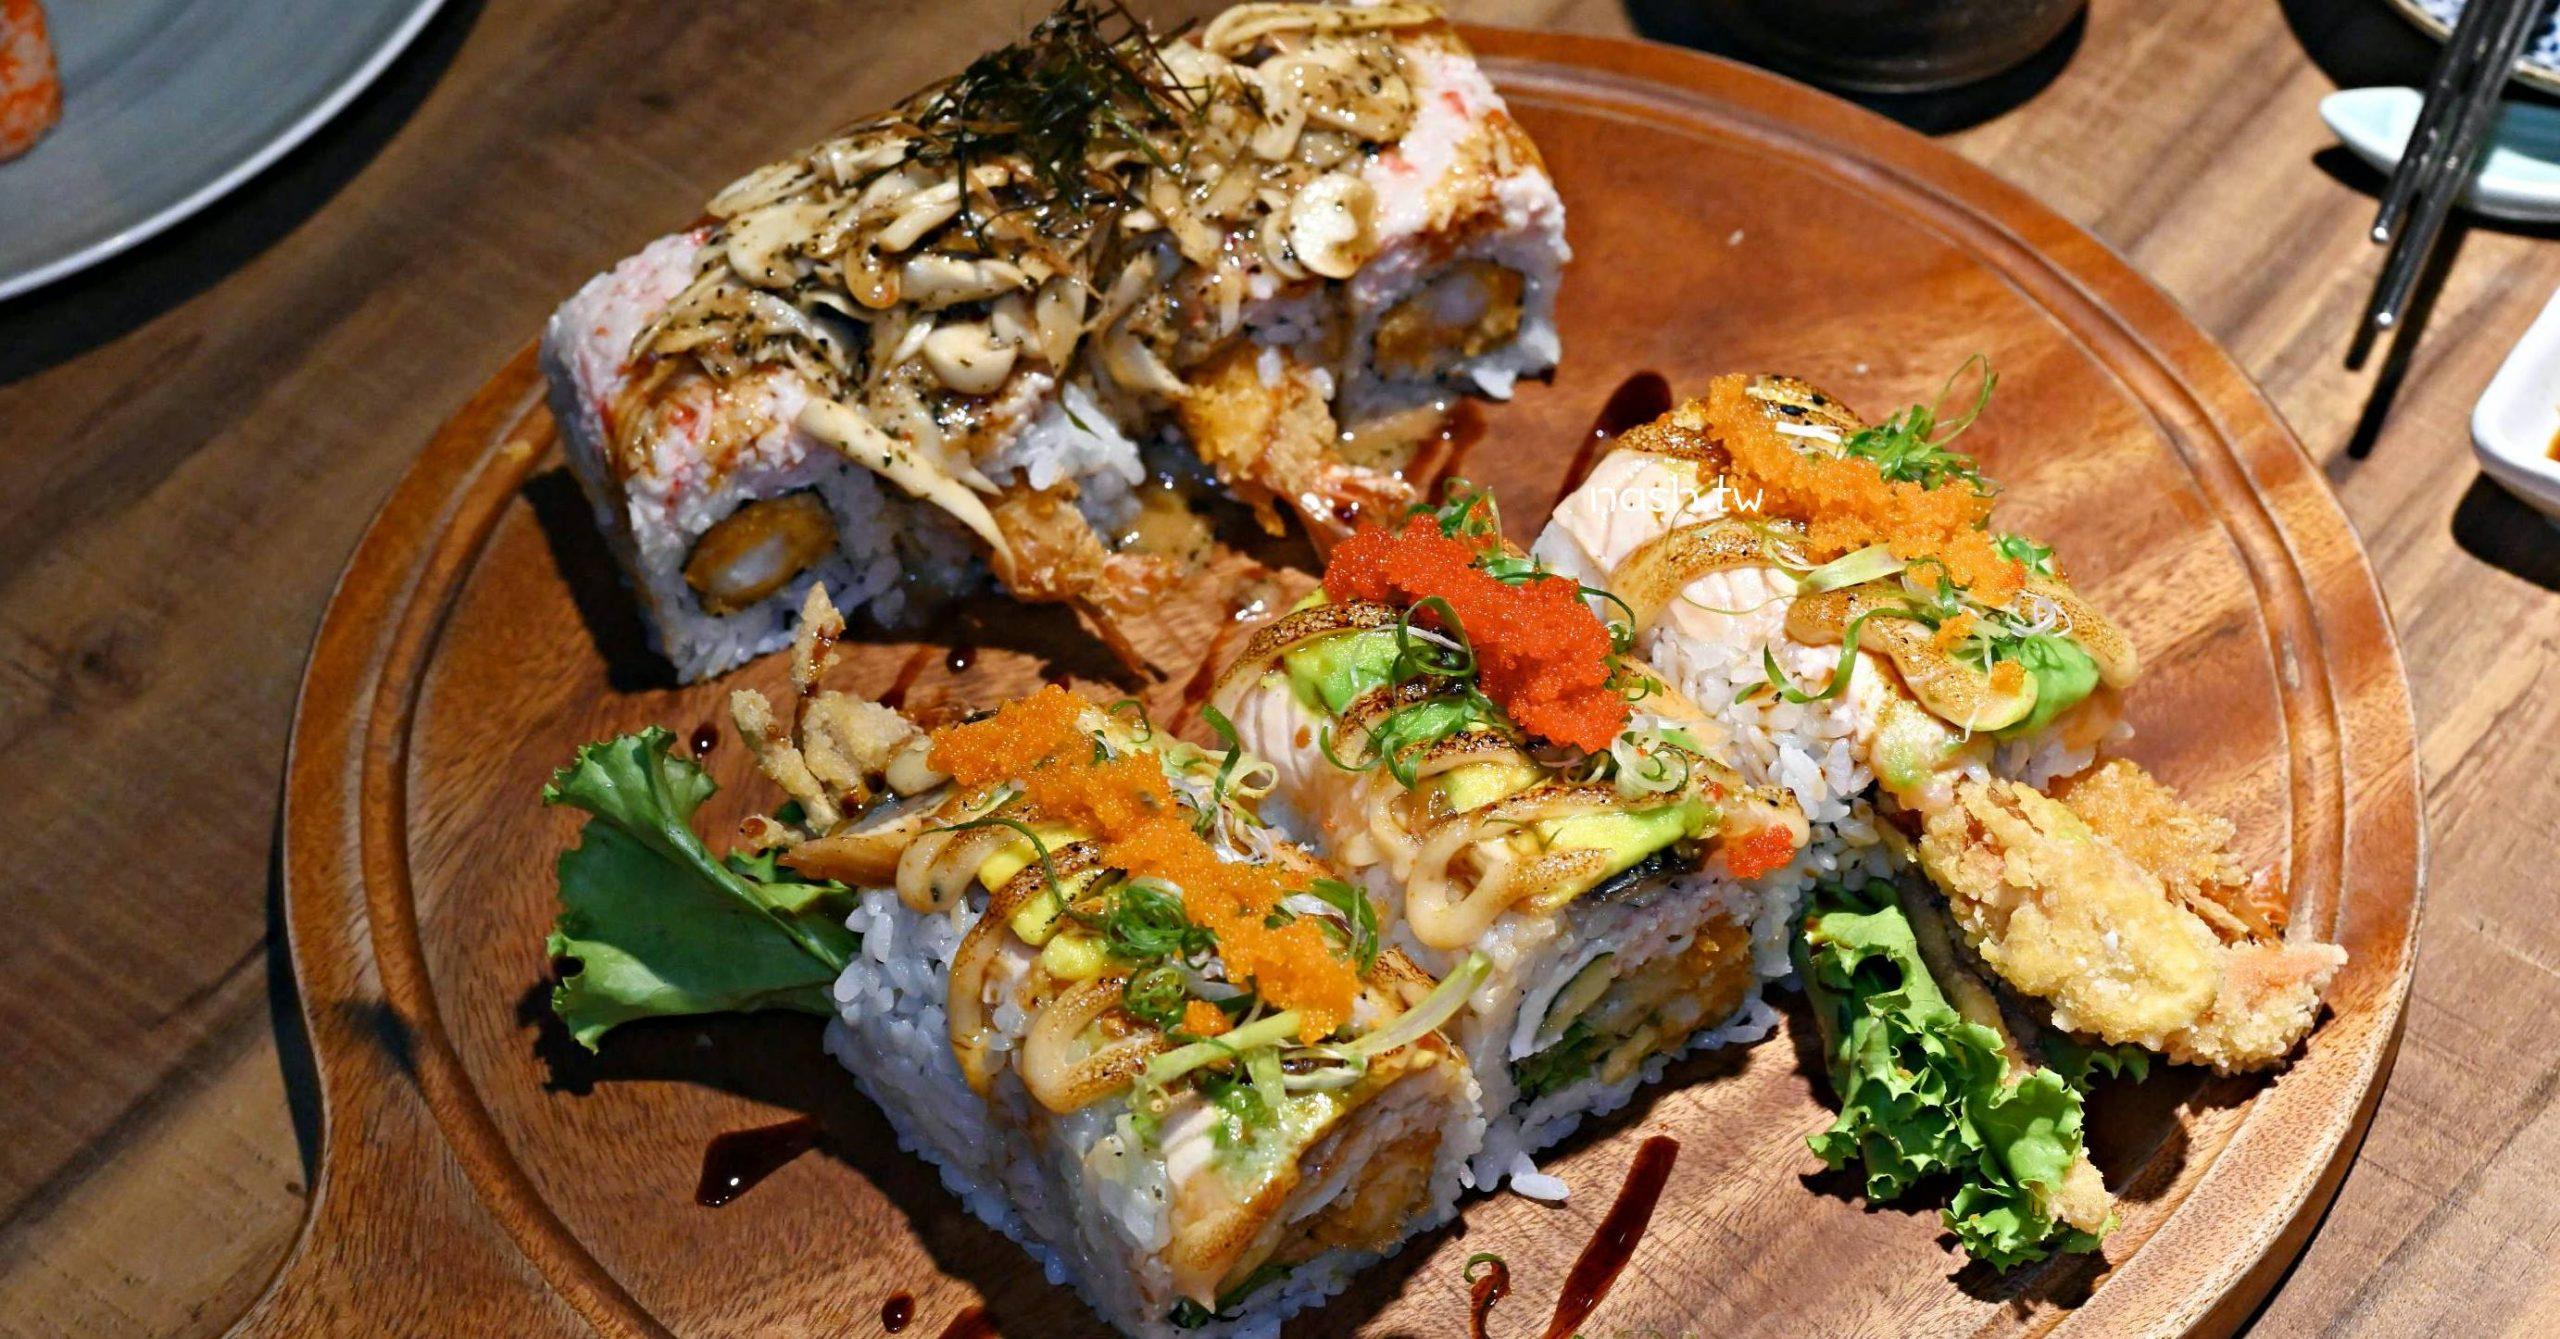 NCIS 德相美式加州壽司|南京復興美食-重口味加州卷吃起來 (菜單)